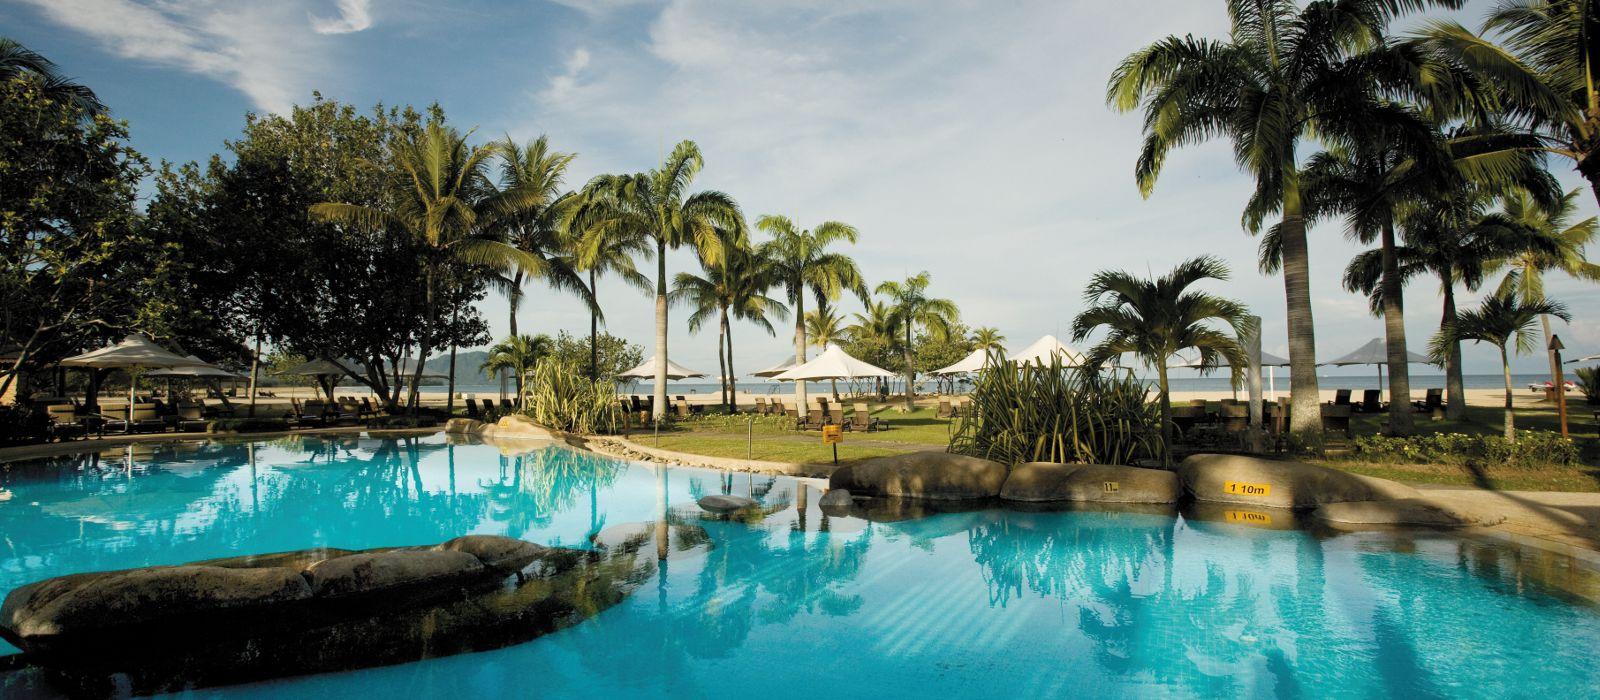 Shangri la rasa ria resort spa hotel in malaysia Hotel near mall of asia with swimming pool